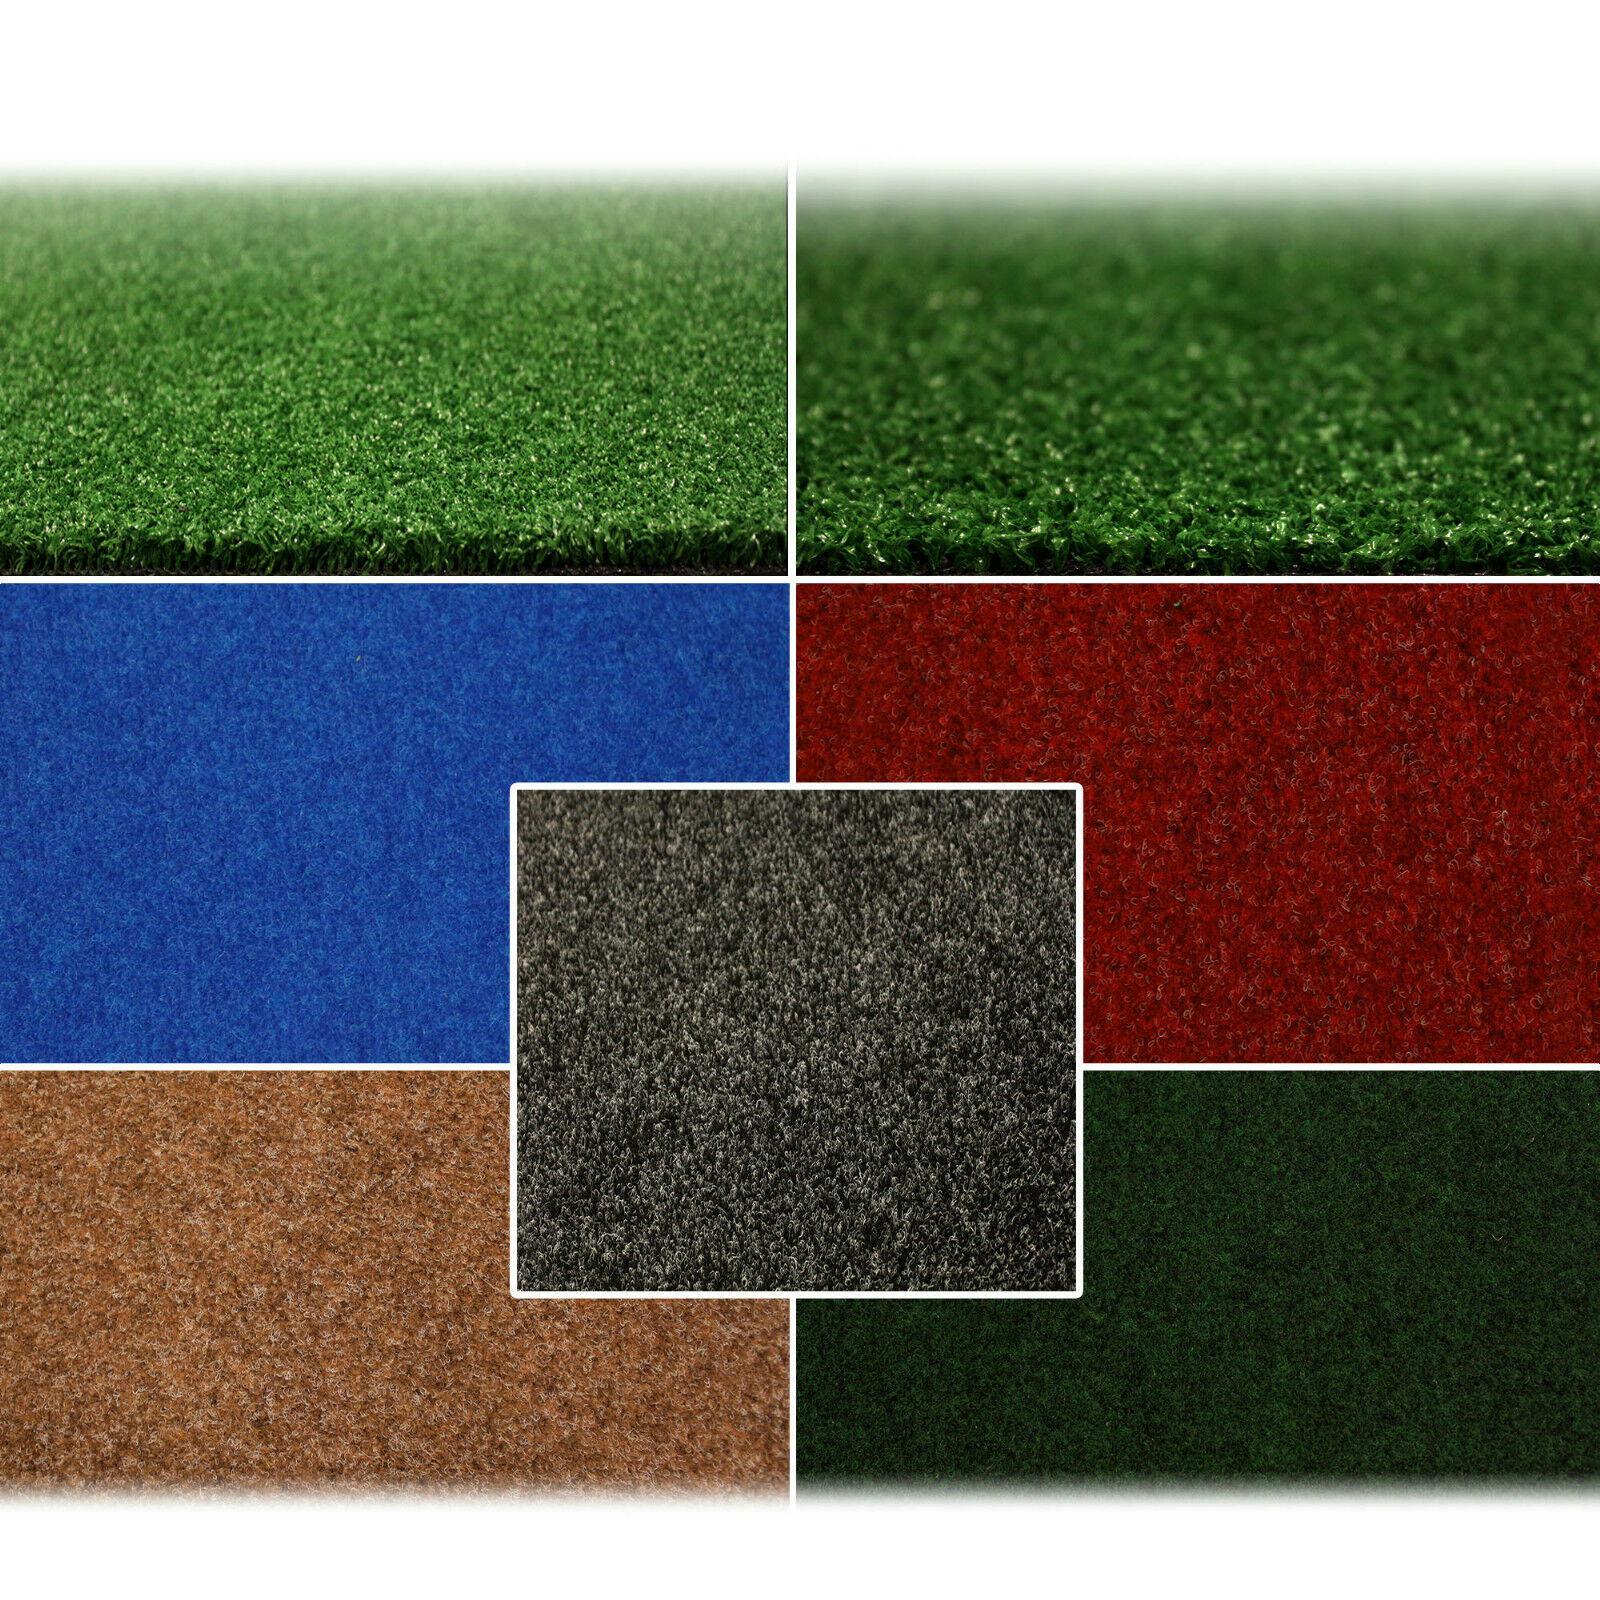 Outdoor Artificial Turf Blue Synthetic Gr Carpet - Carpet ...